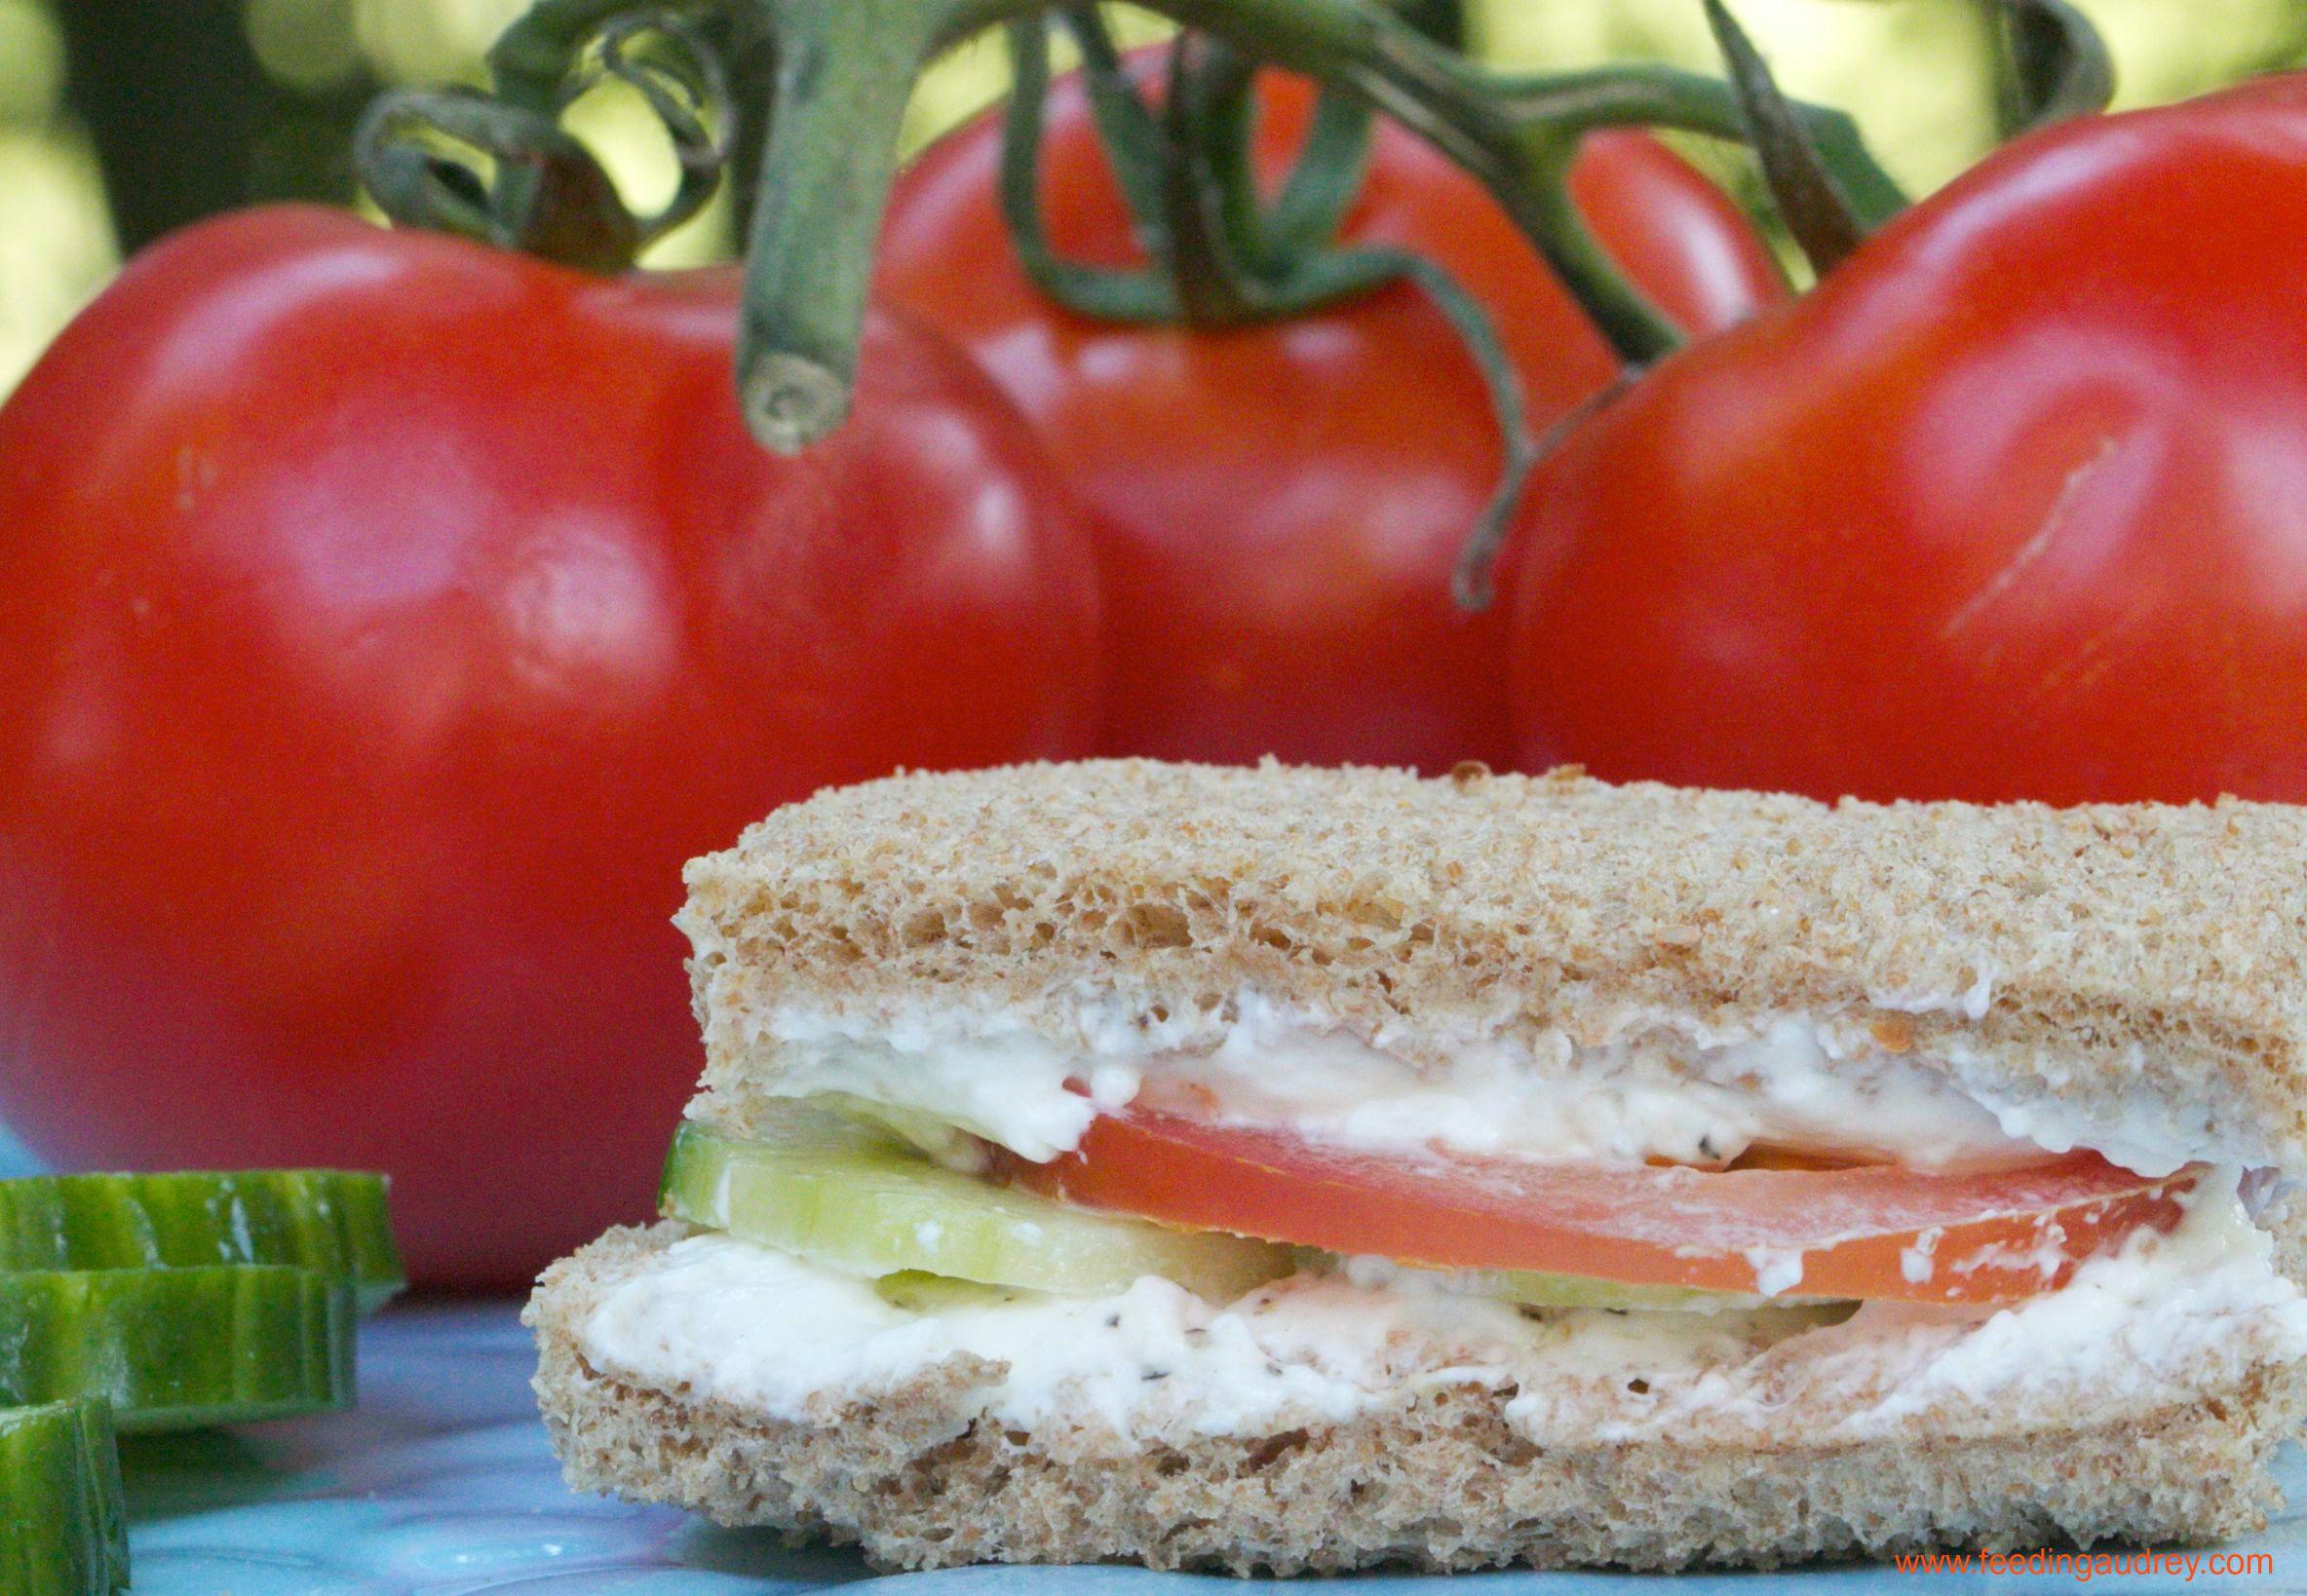 Watch How to Make a Cucumber Cream Cheese Sandwich video